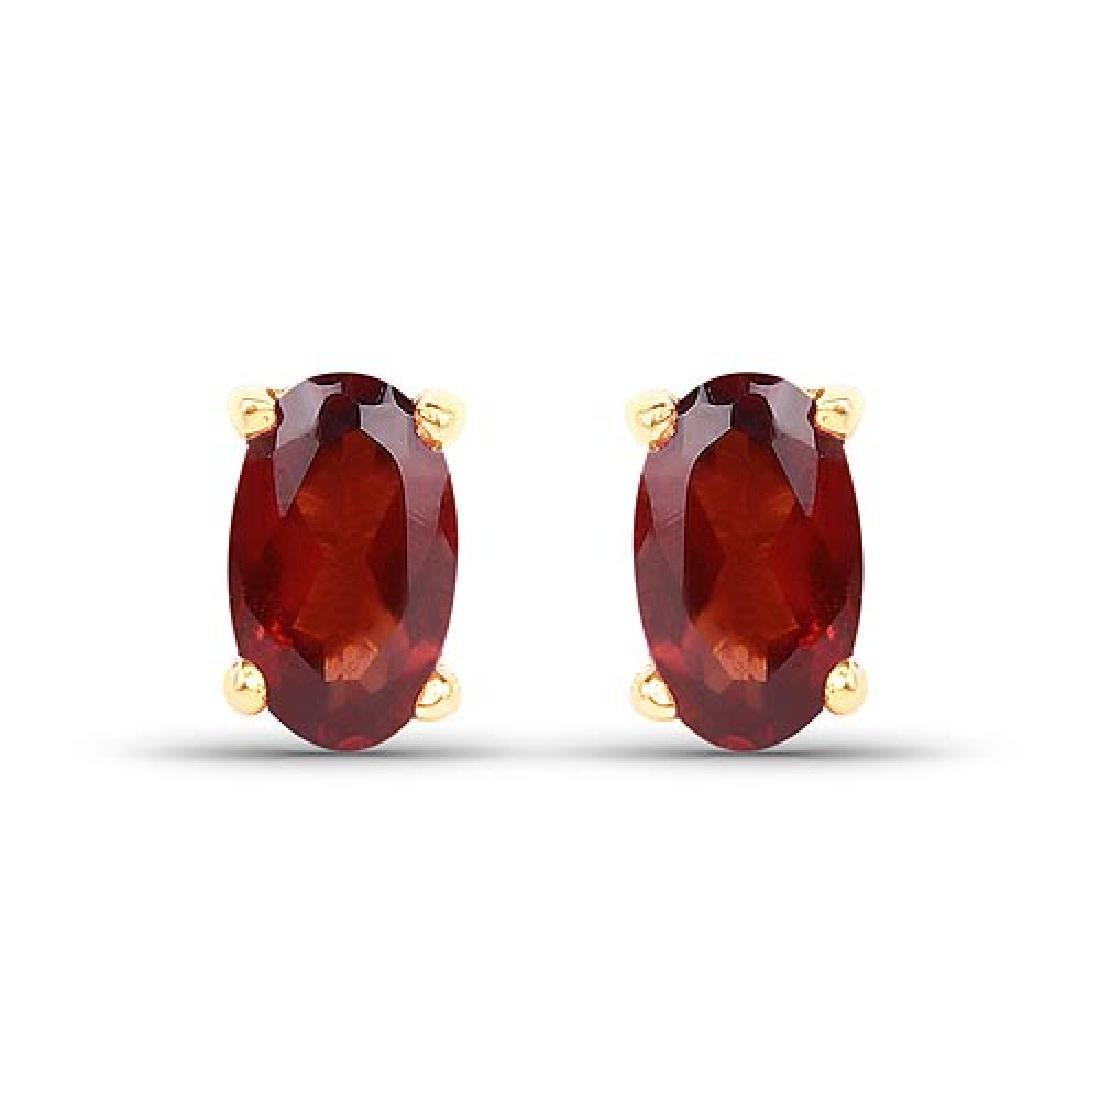 0.64 Carat Genuine Garnet 10K Yellow Gold Earrings